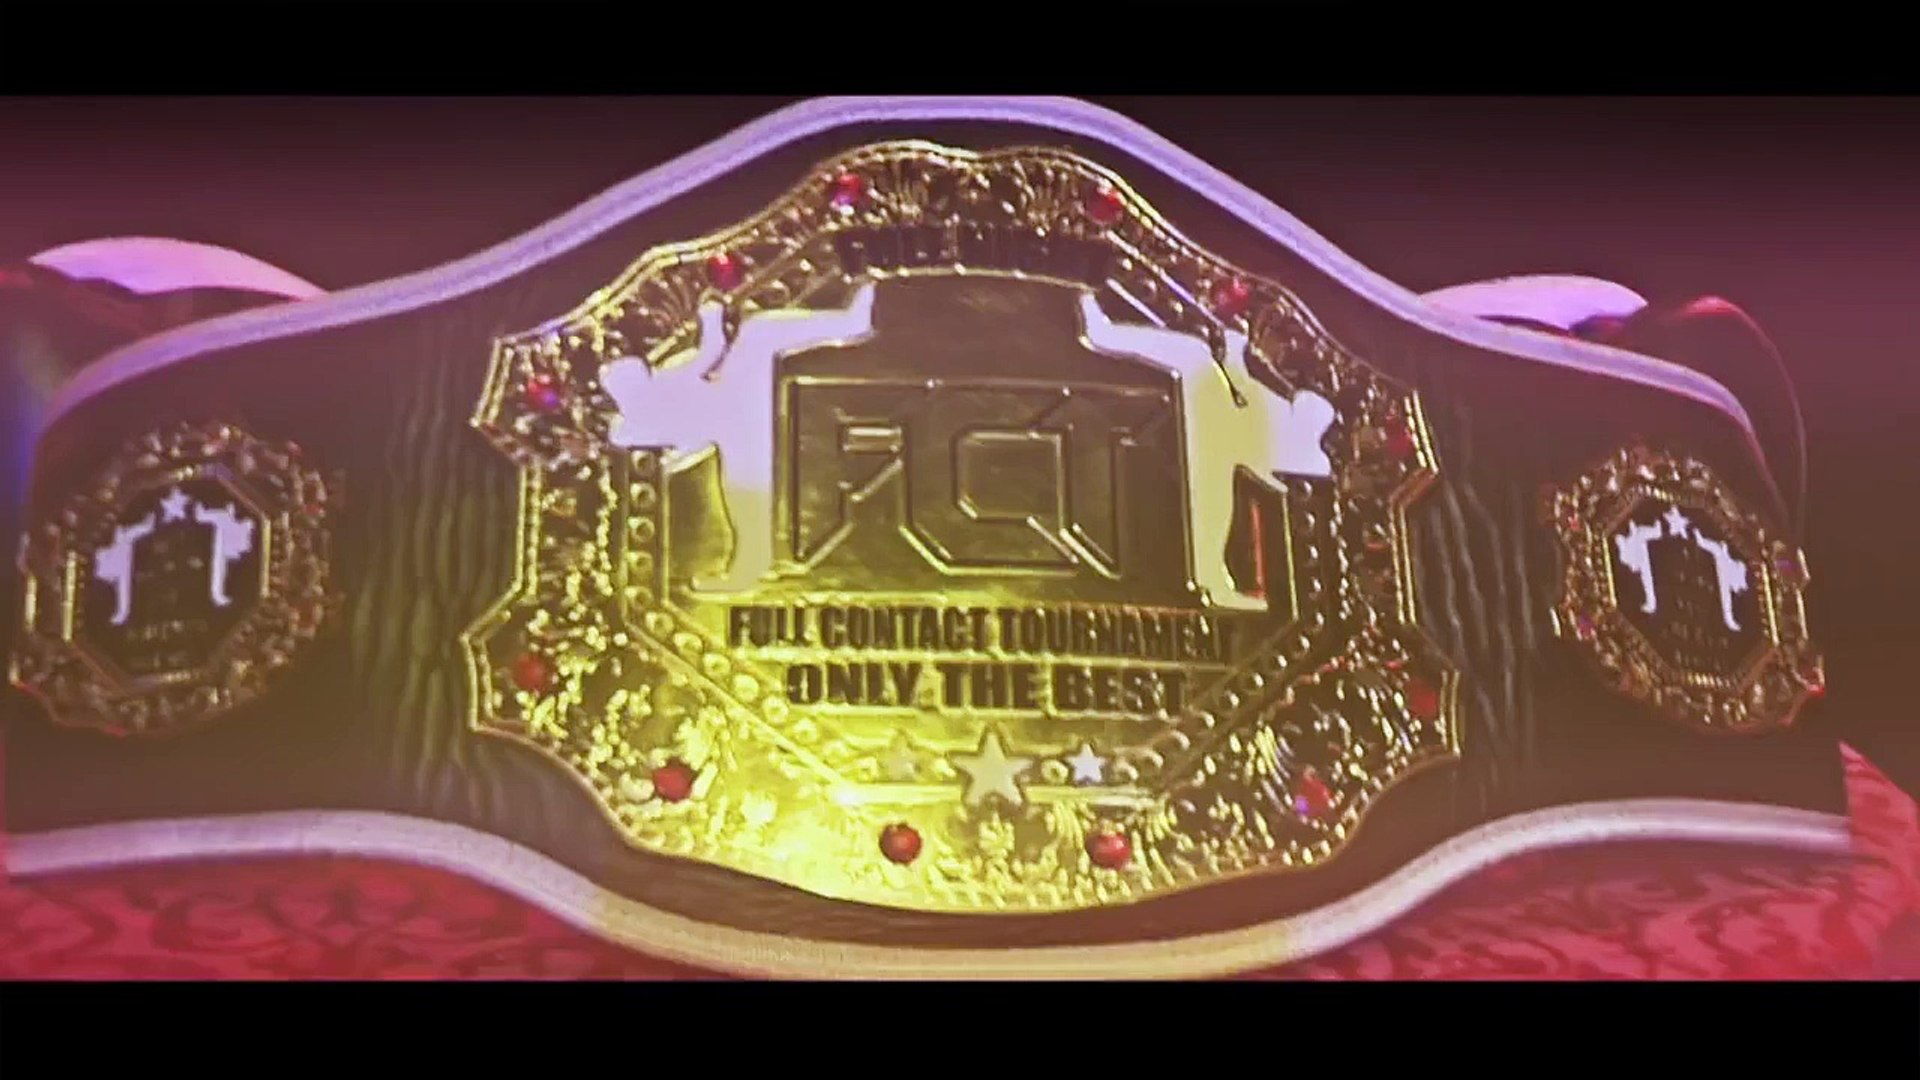 AGDE - 2015 - FULL NIGHT 2015 - Barrière Fighting Sports le samedi 12 décembre 2015